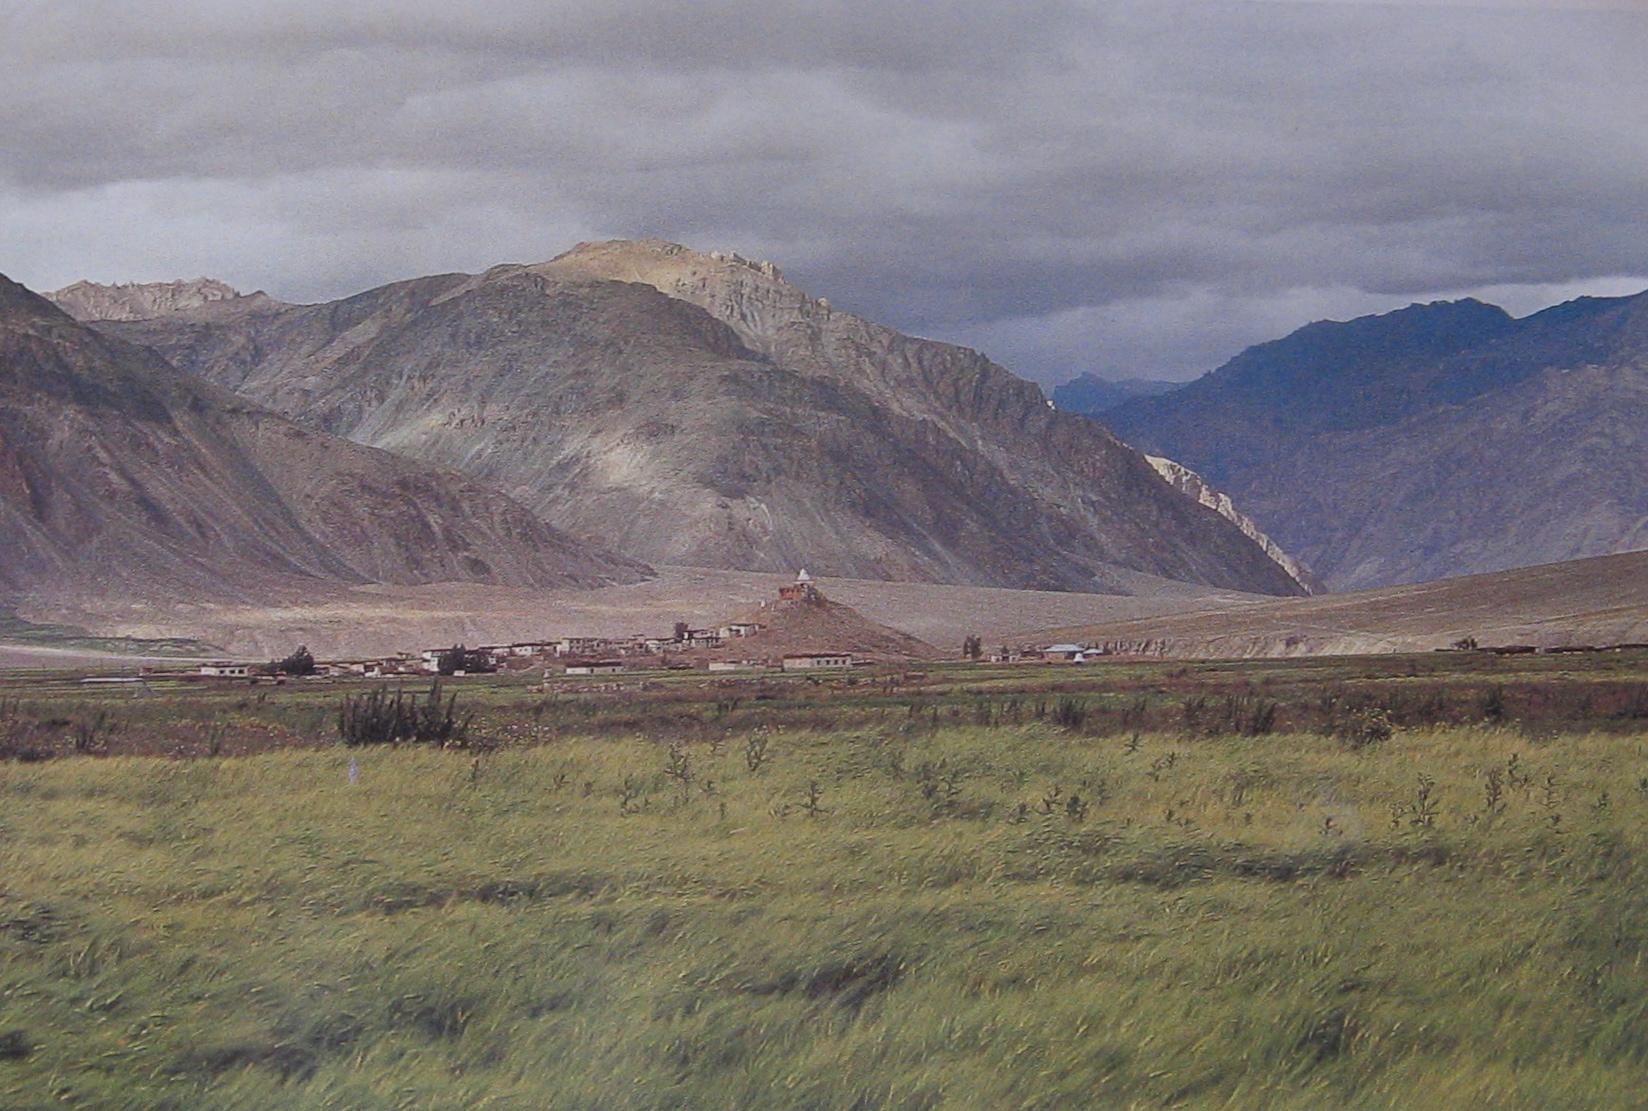 Pipting Village,Ladakh